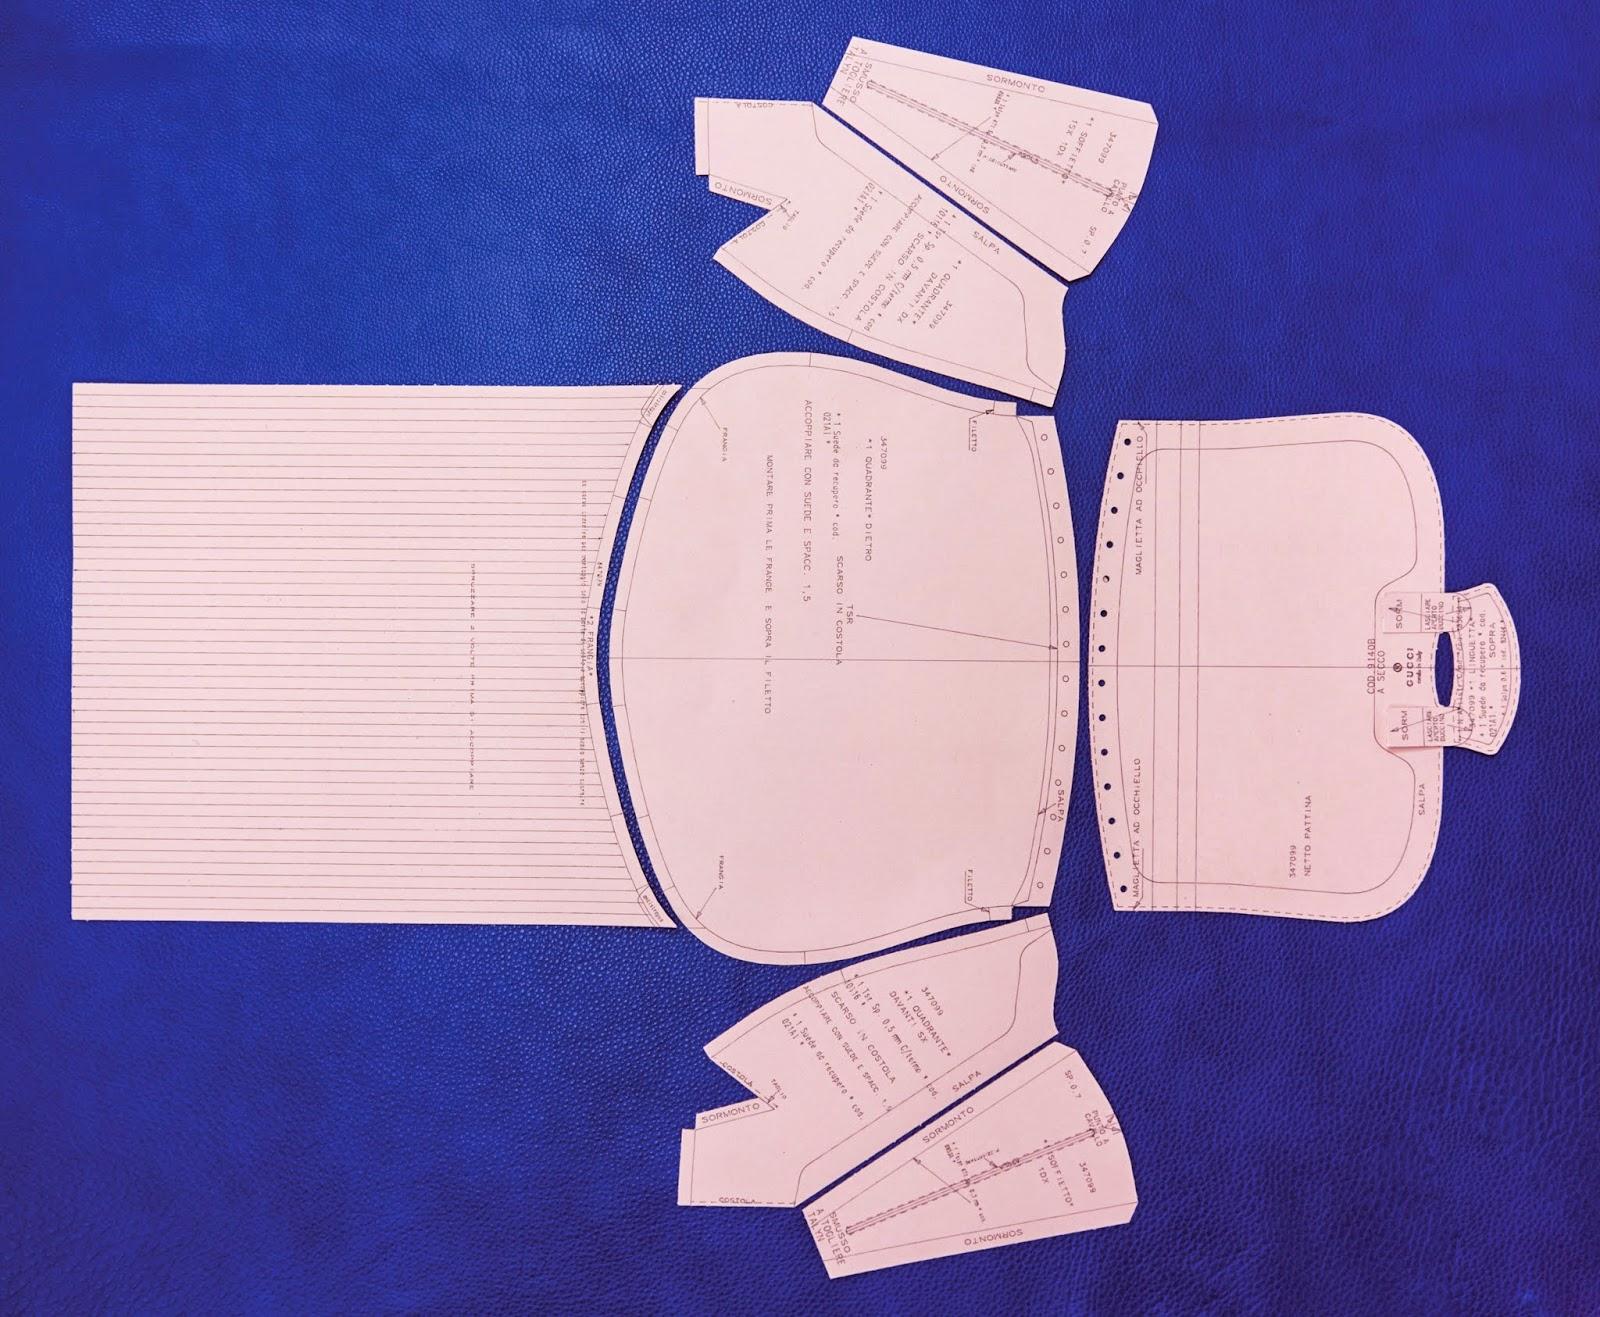 Spotlight On: The Making of the Gucci Noveau Fringe Bag